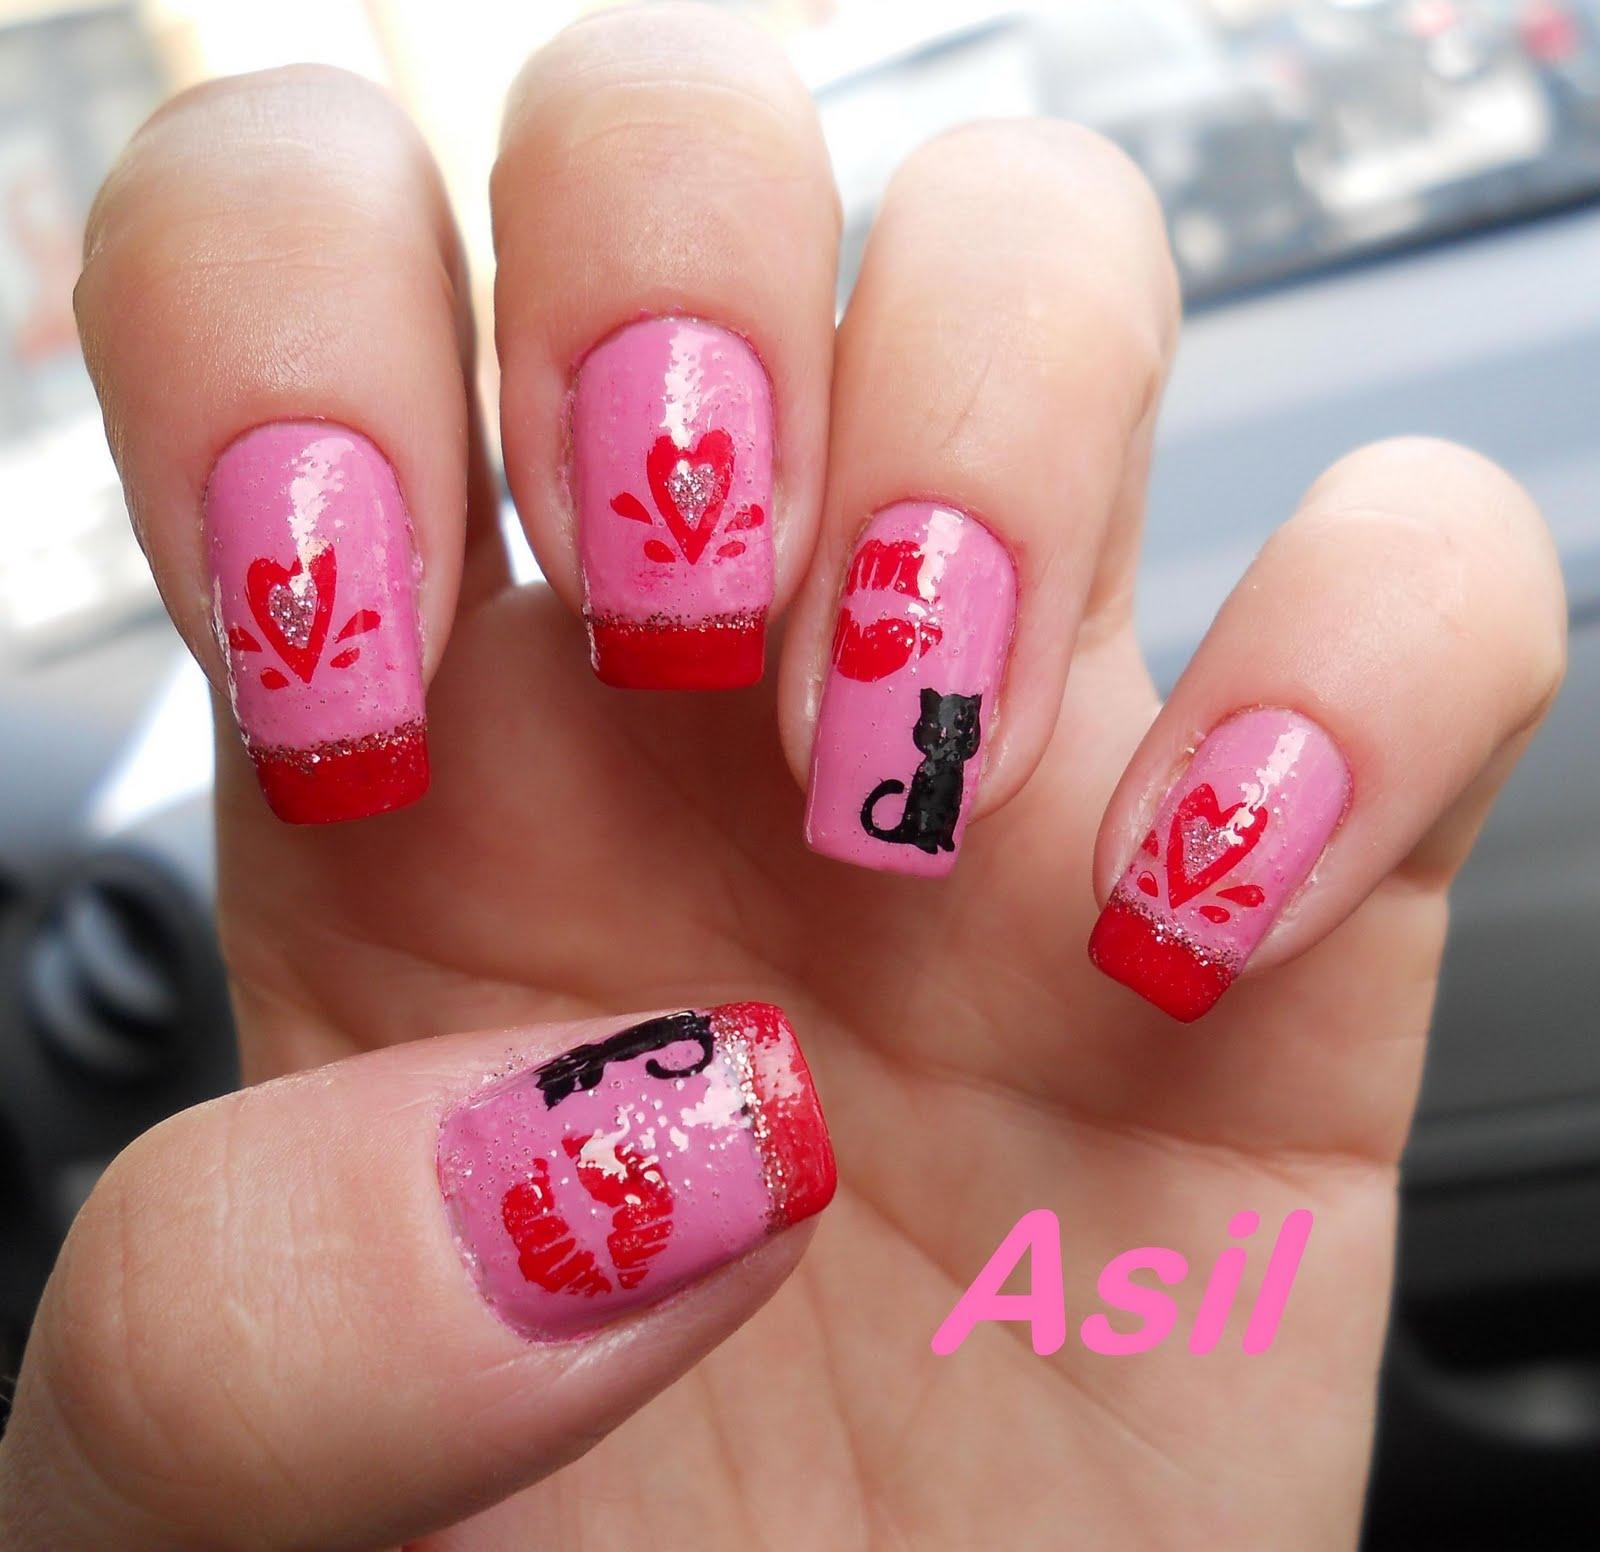 Nail Art Designs 2011: Acrylic Nail Art Designs: [CLOSED] Valentine's Day